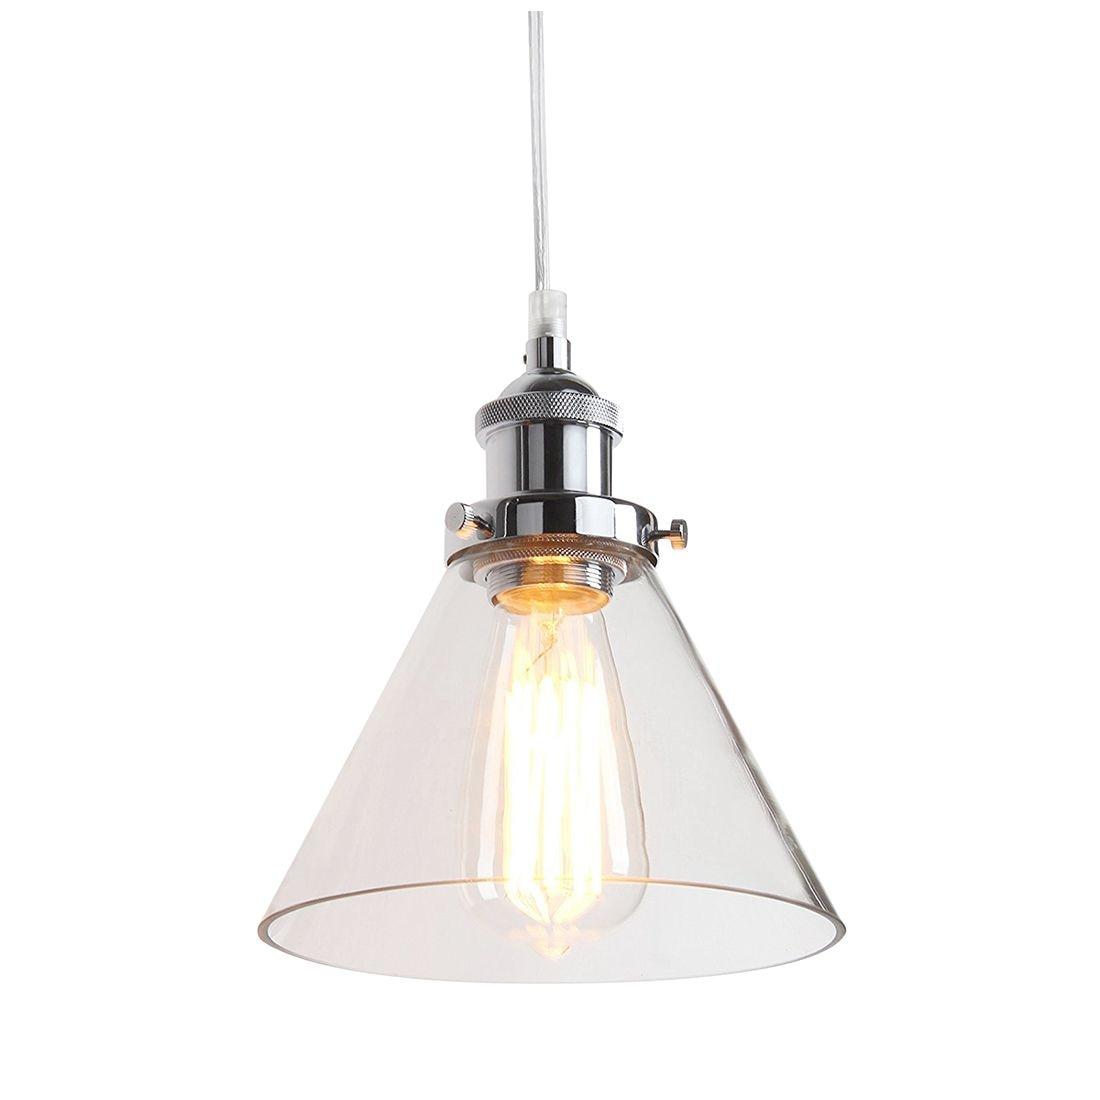 Industrial Kitchen Lights Industrial Kitchen Lighting Promotion Shop For Promotional